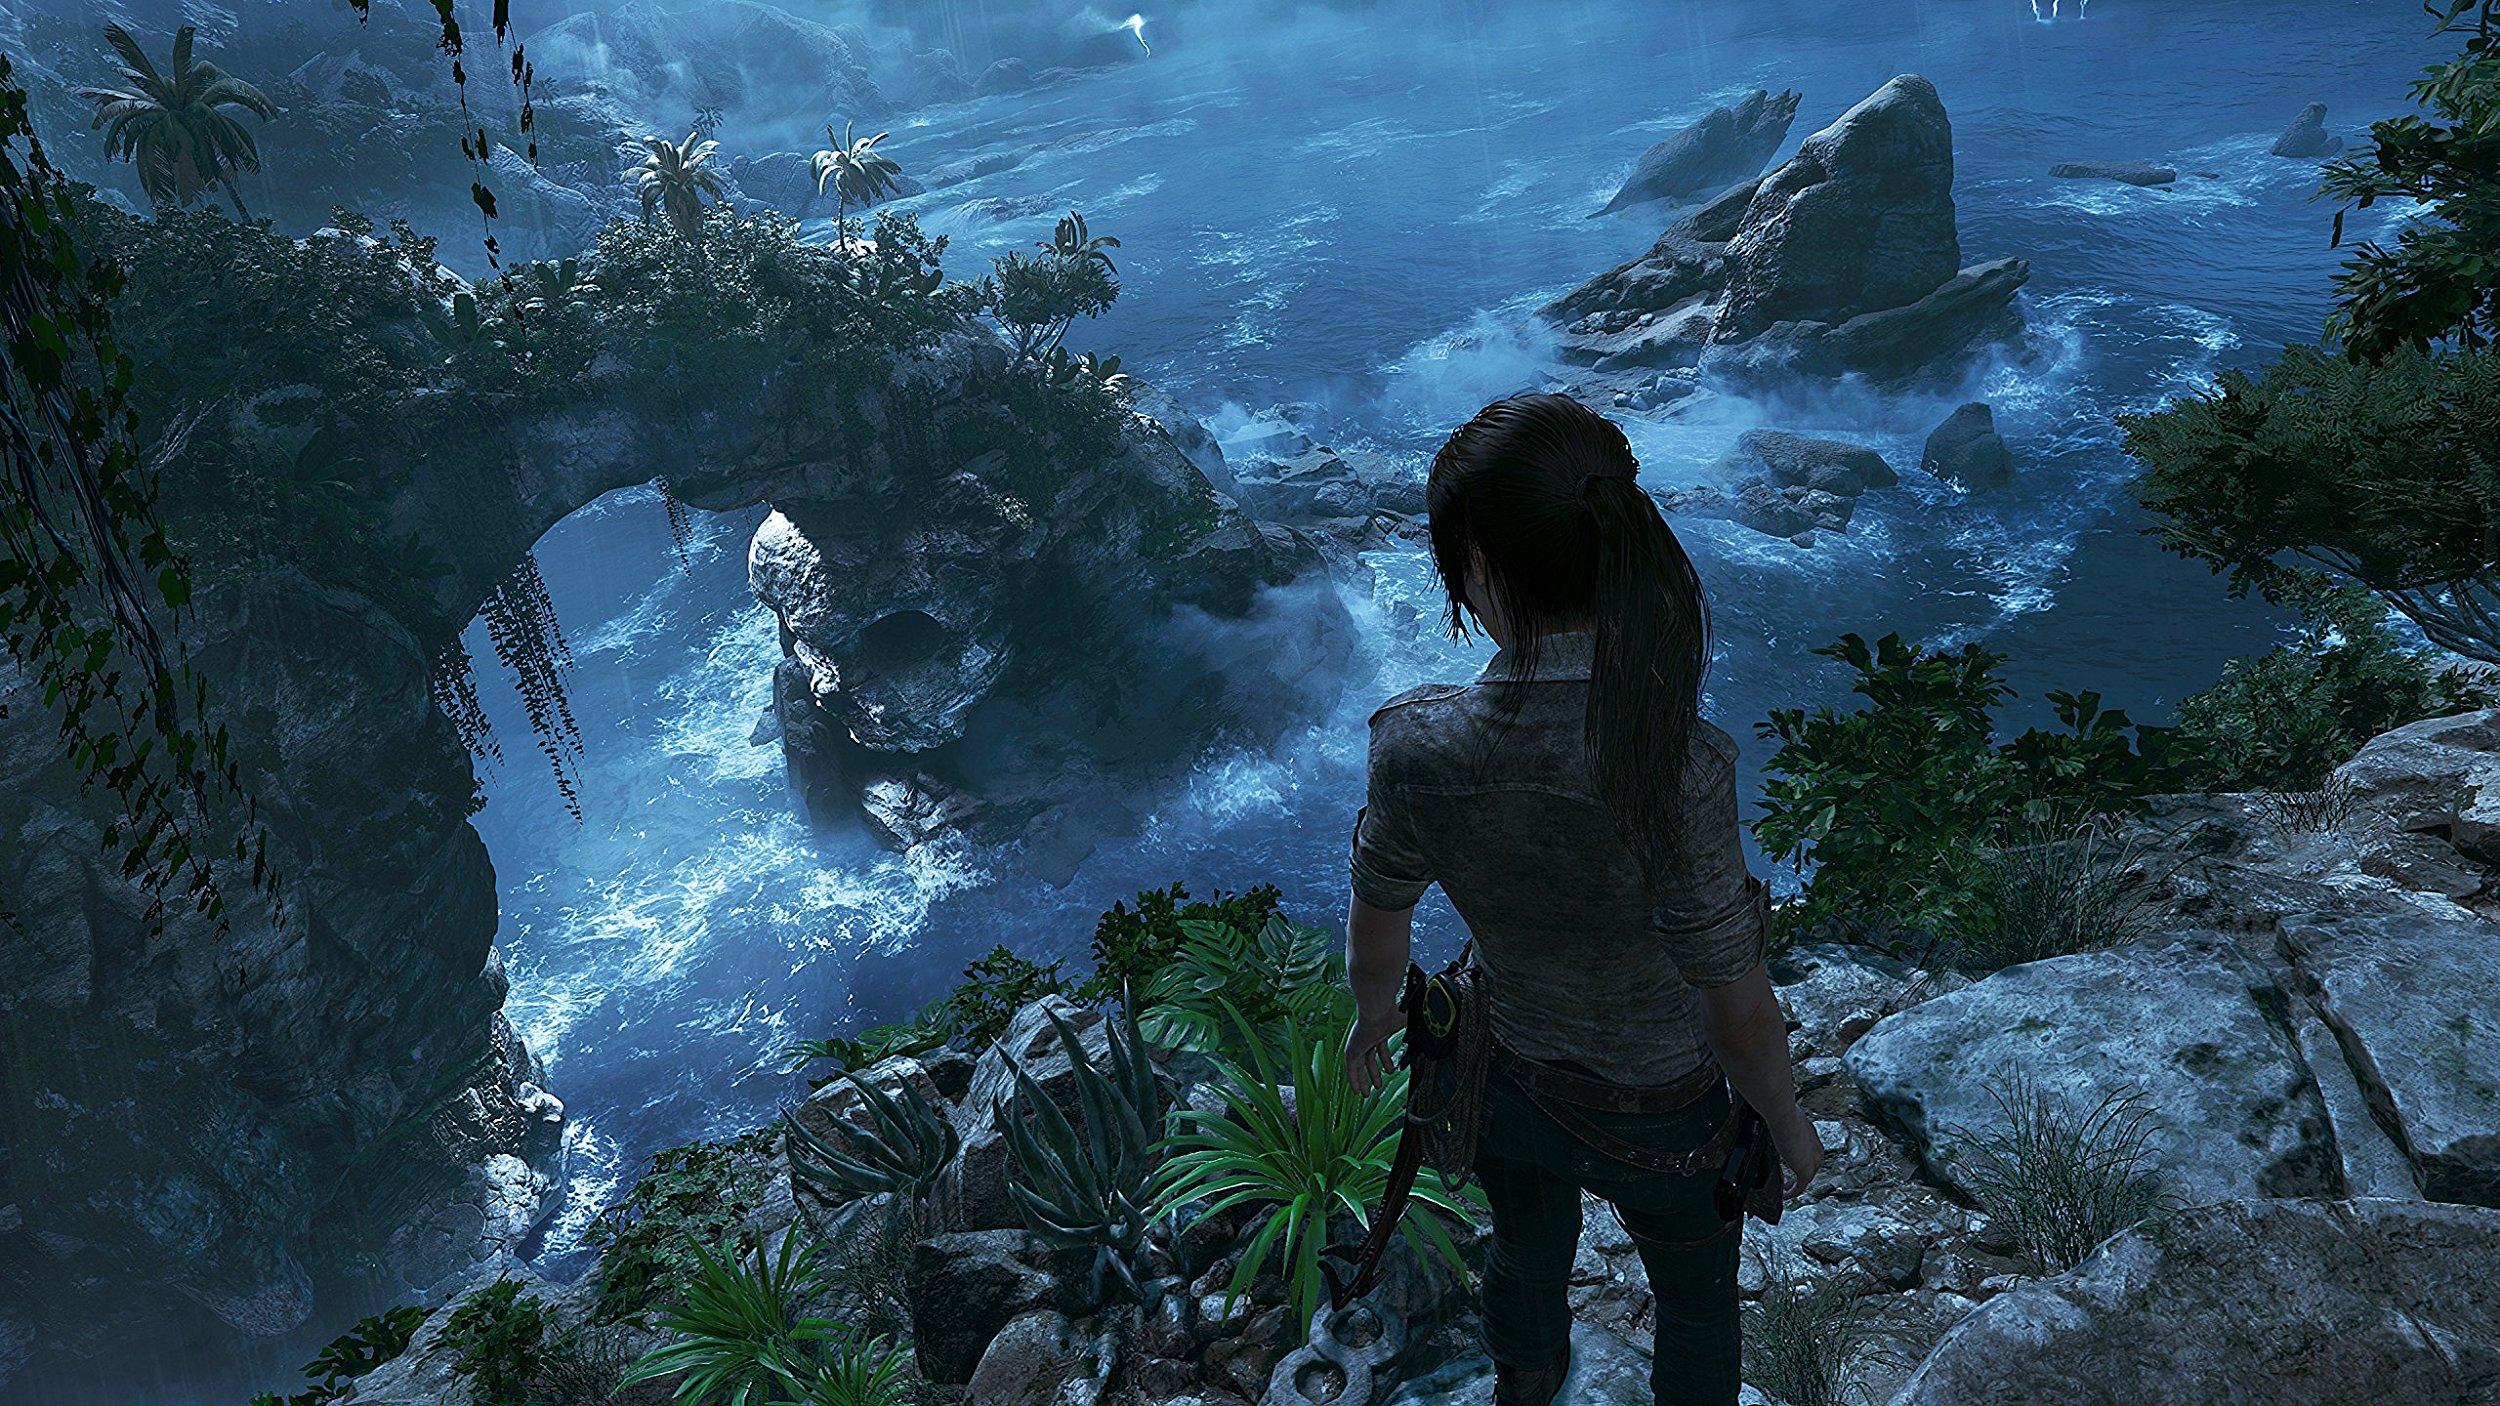 General 2500x1406 Shadow of the Tomb Raider Tomb Raider 2018 video games water Tomb Raider screen shot rock coast cliff Lara Croft PC gaming